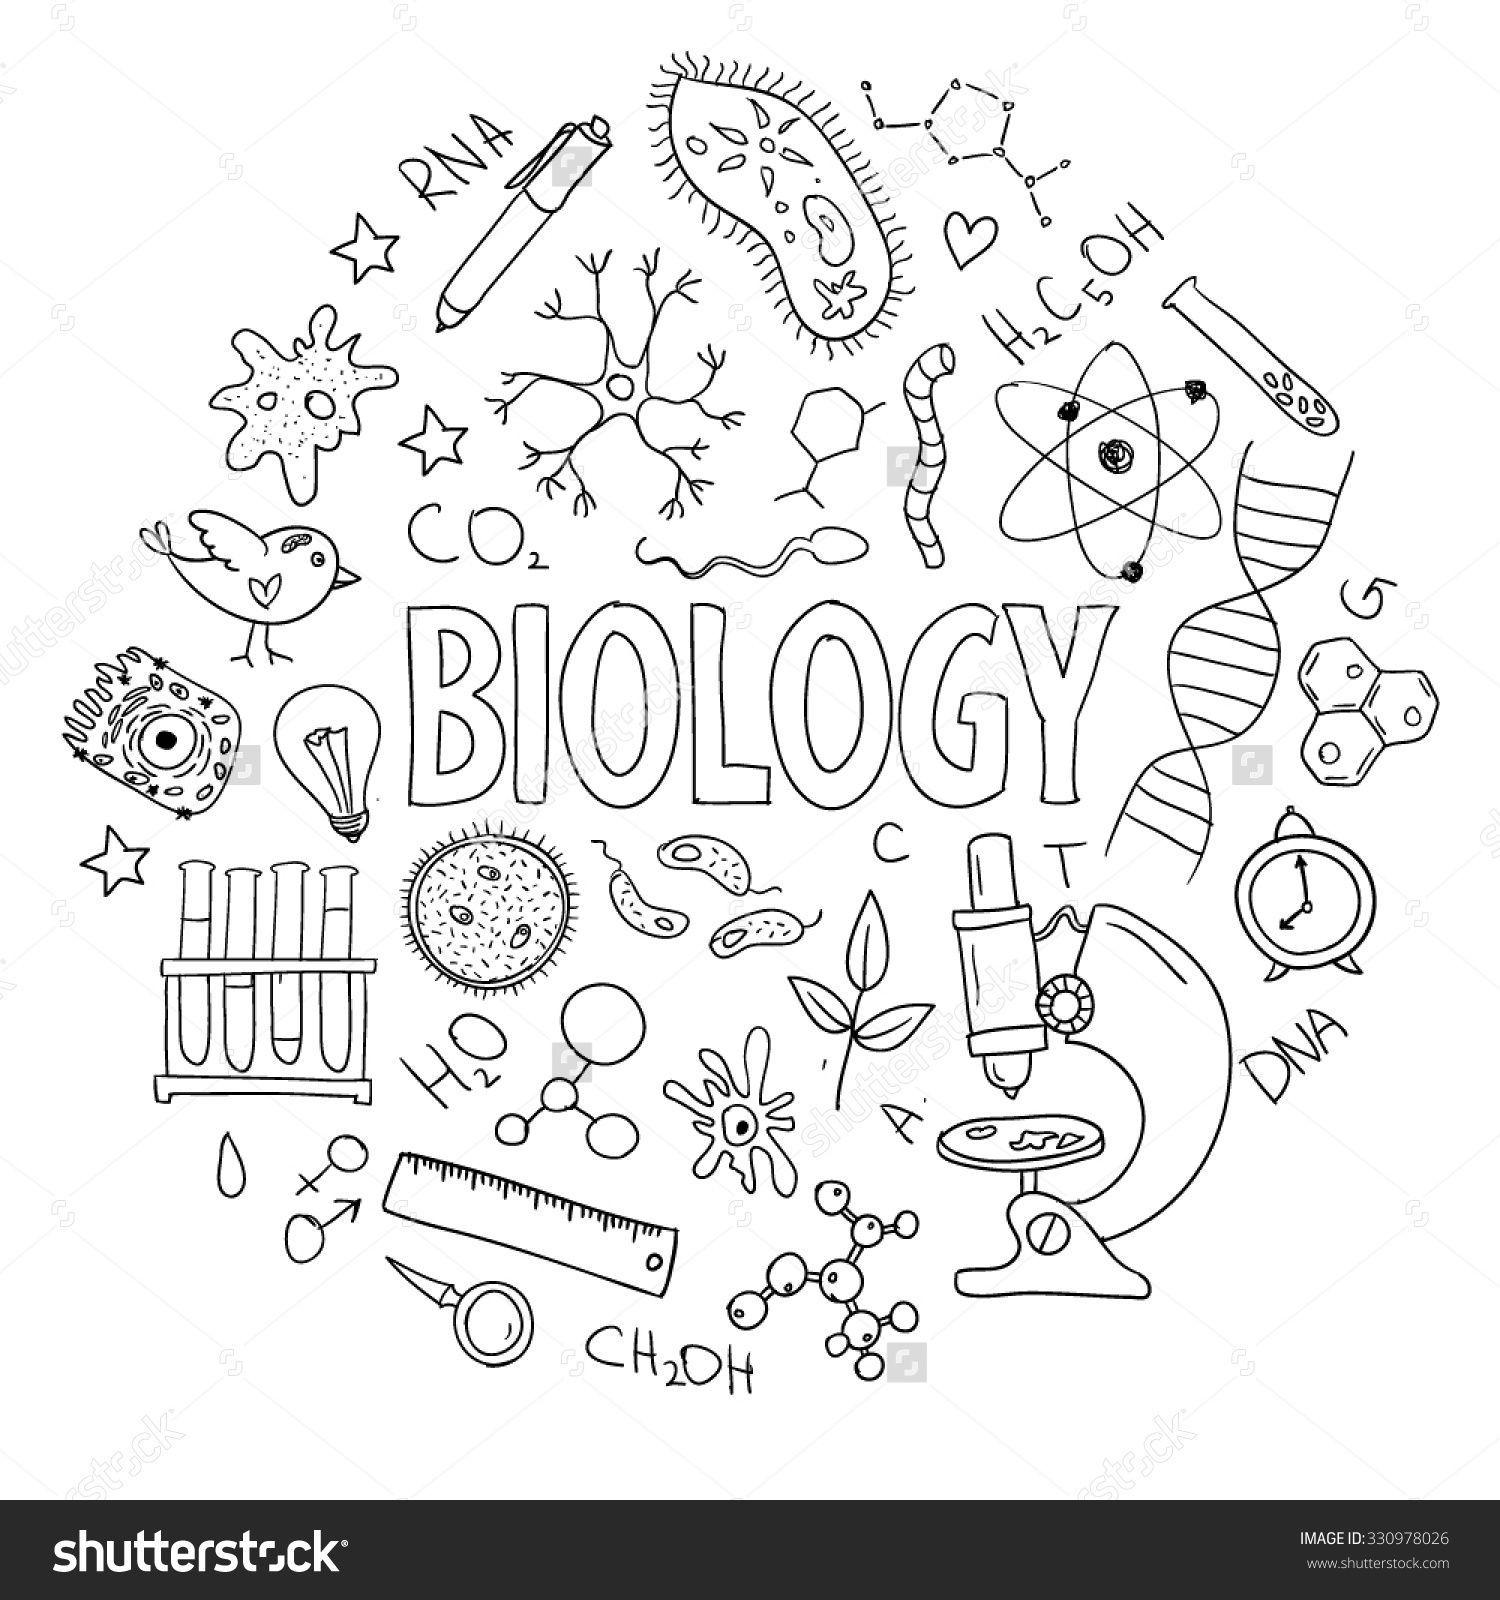 Equipment Biology Vector School Design Drawn Hand